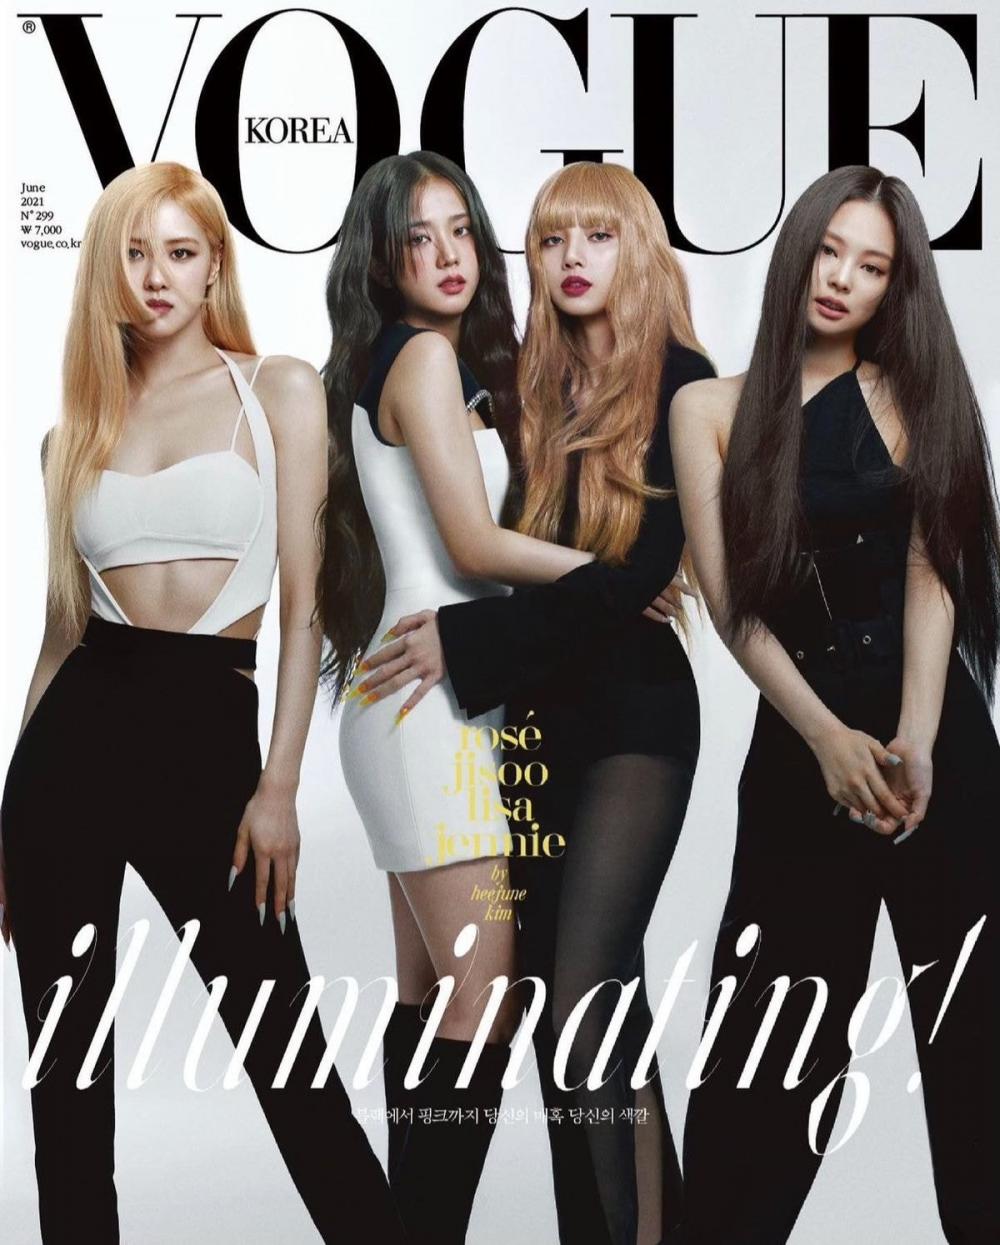 Участницы BLACKPINK на обложке журнала VOGUE Korea | YESASIA